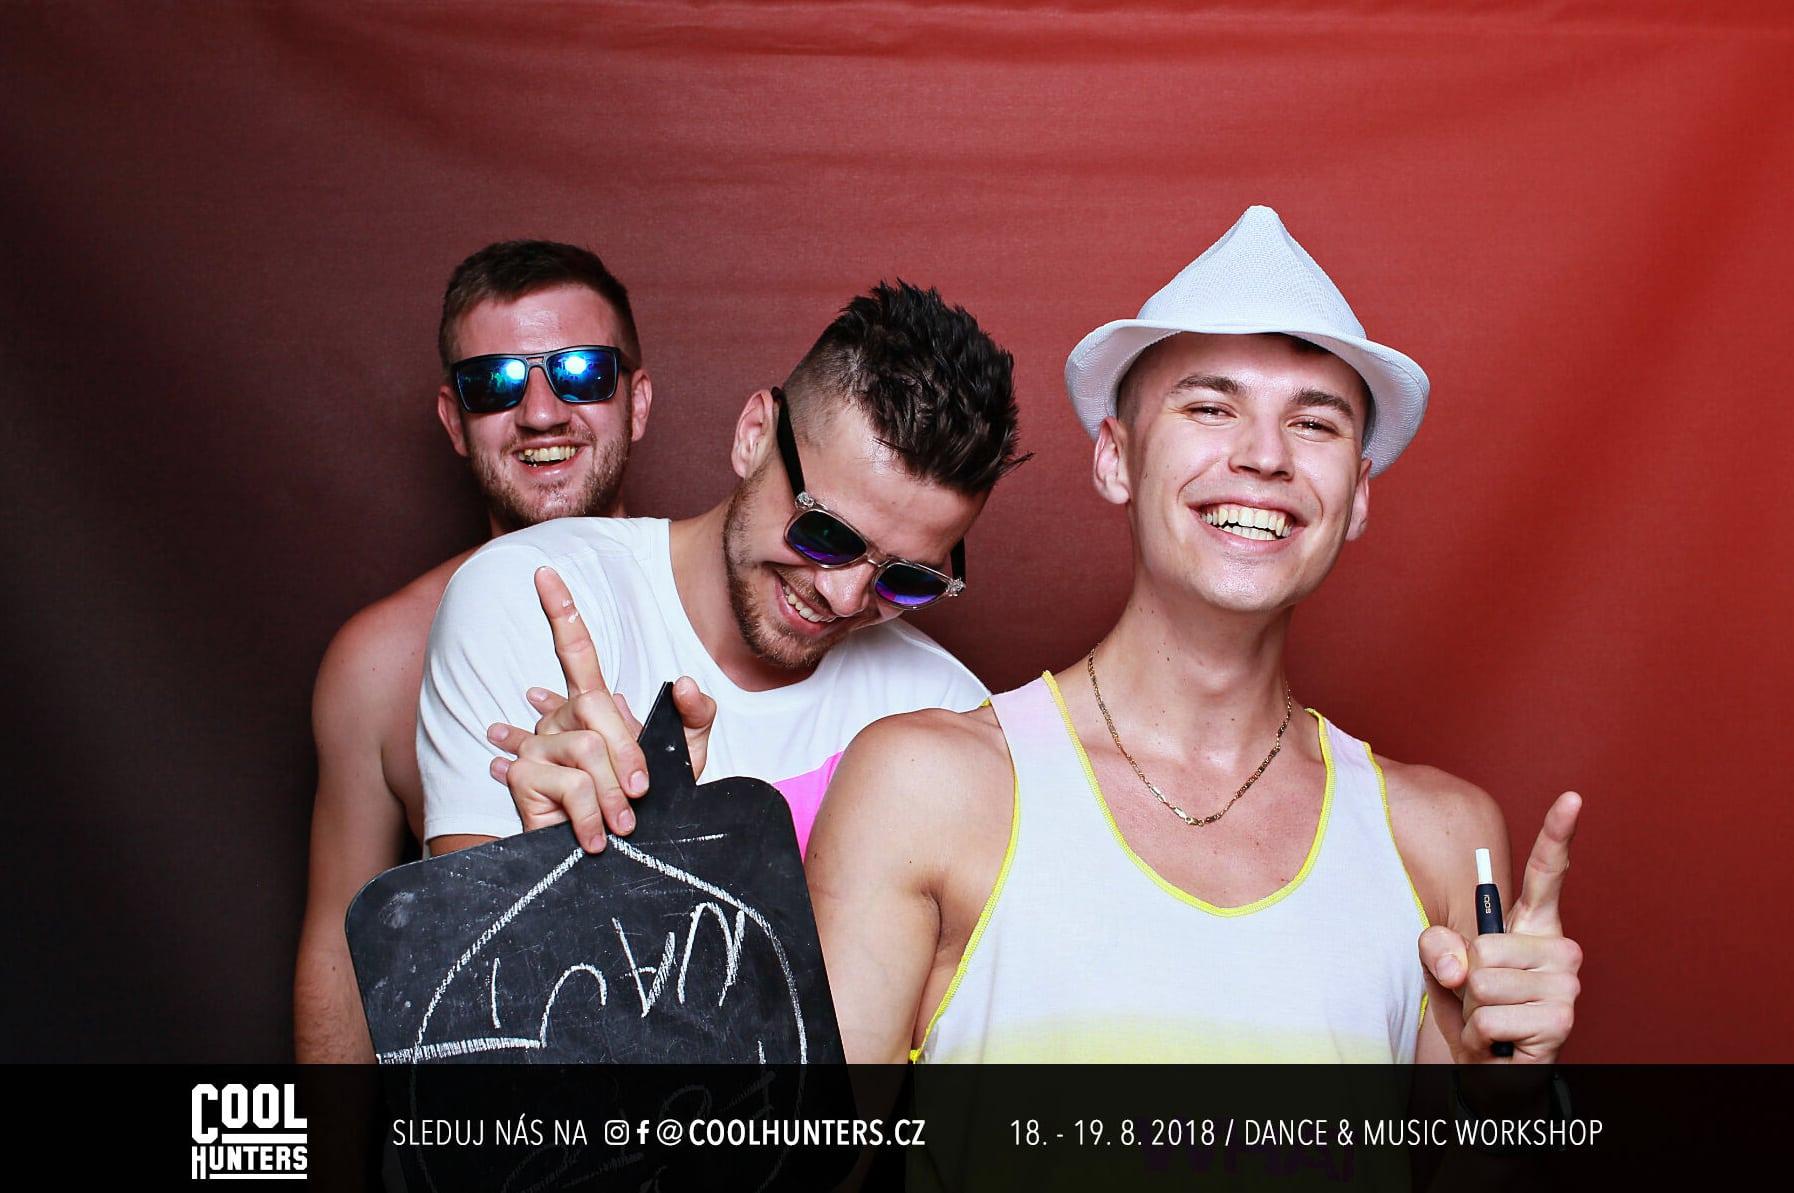 fotokoutek-coolhunters-19-8-2018-471014